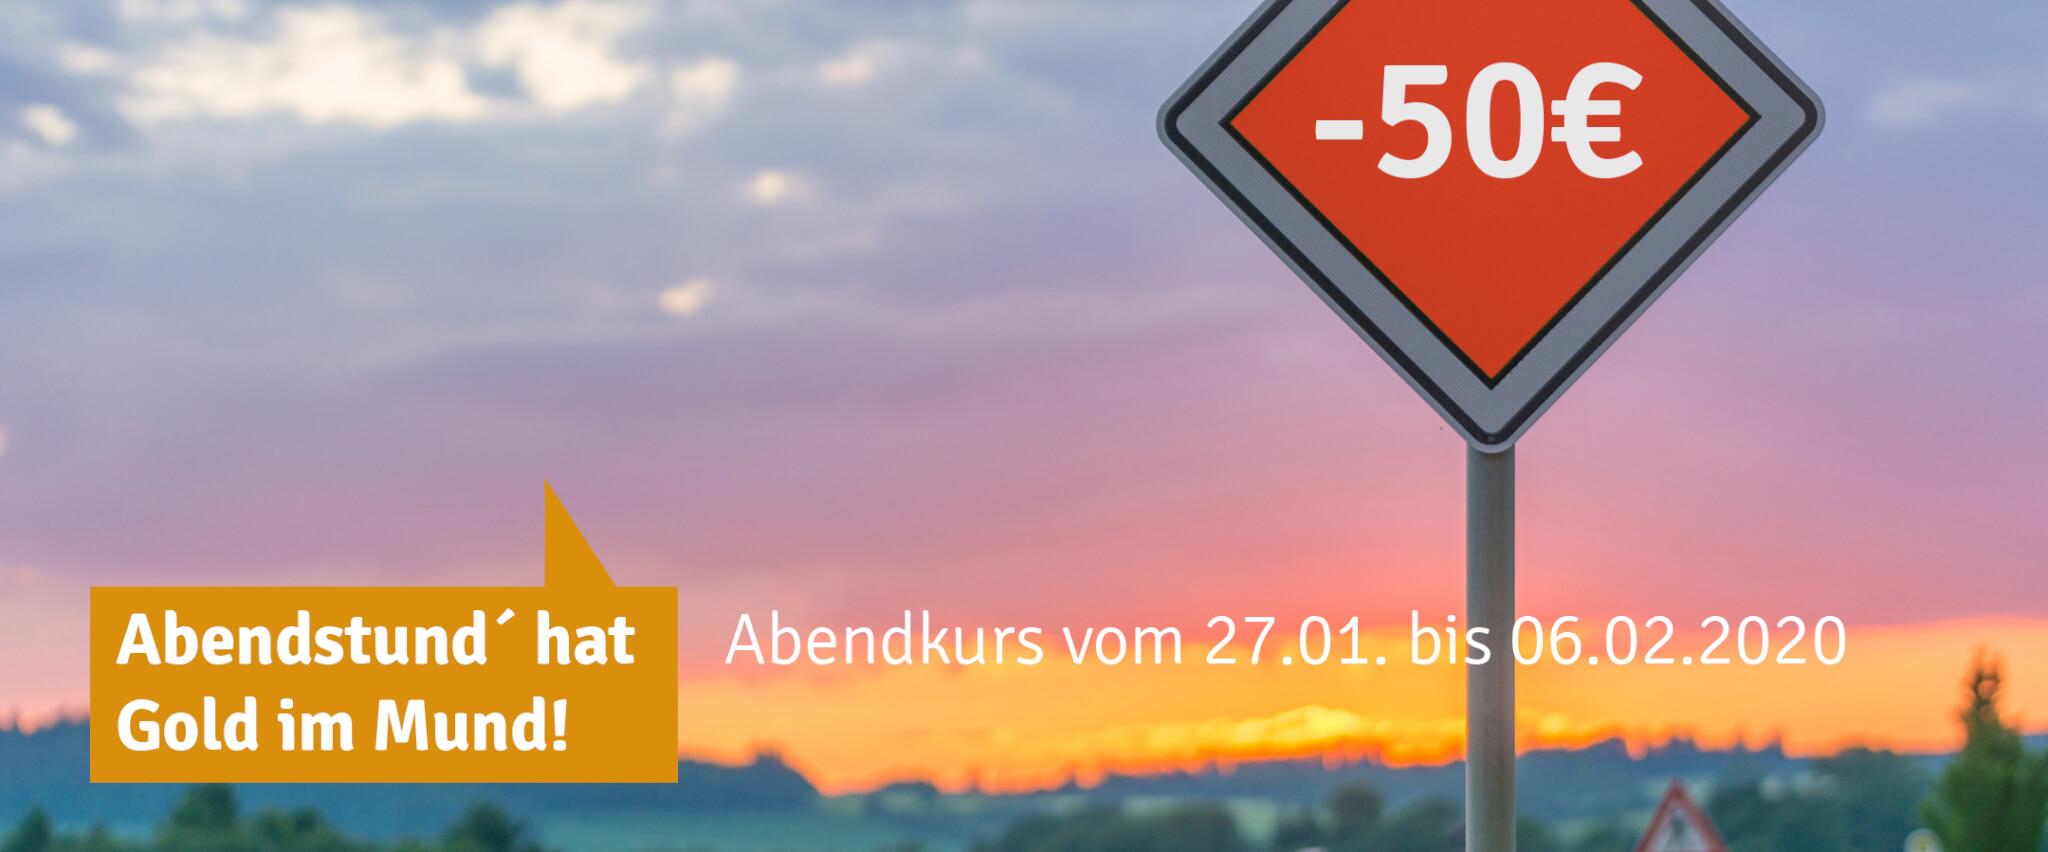 Slider_Abendkurs20-01